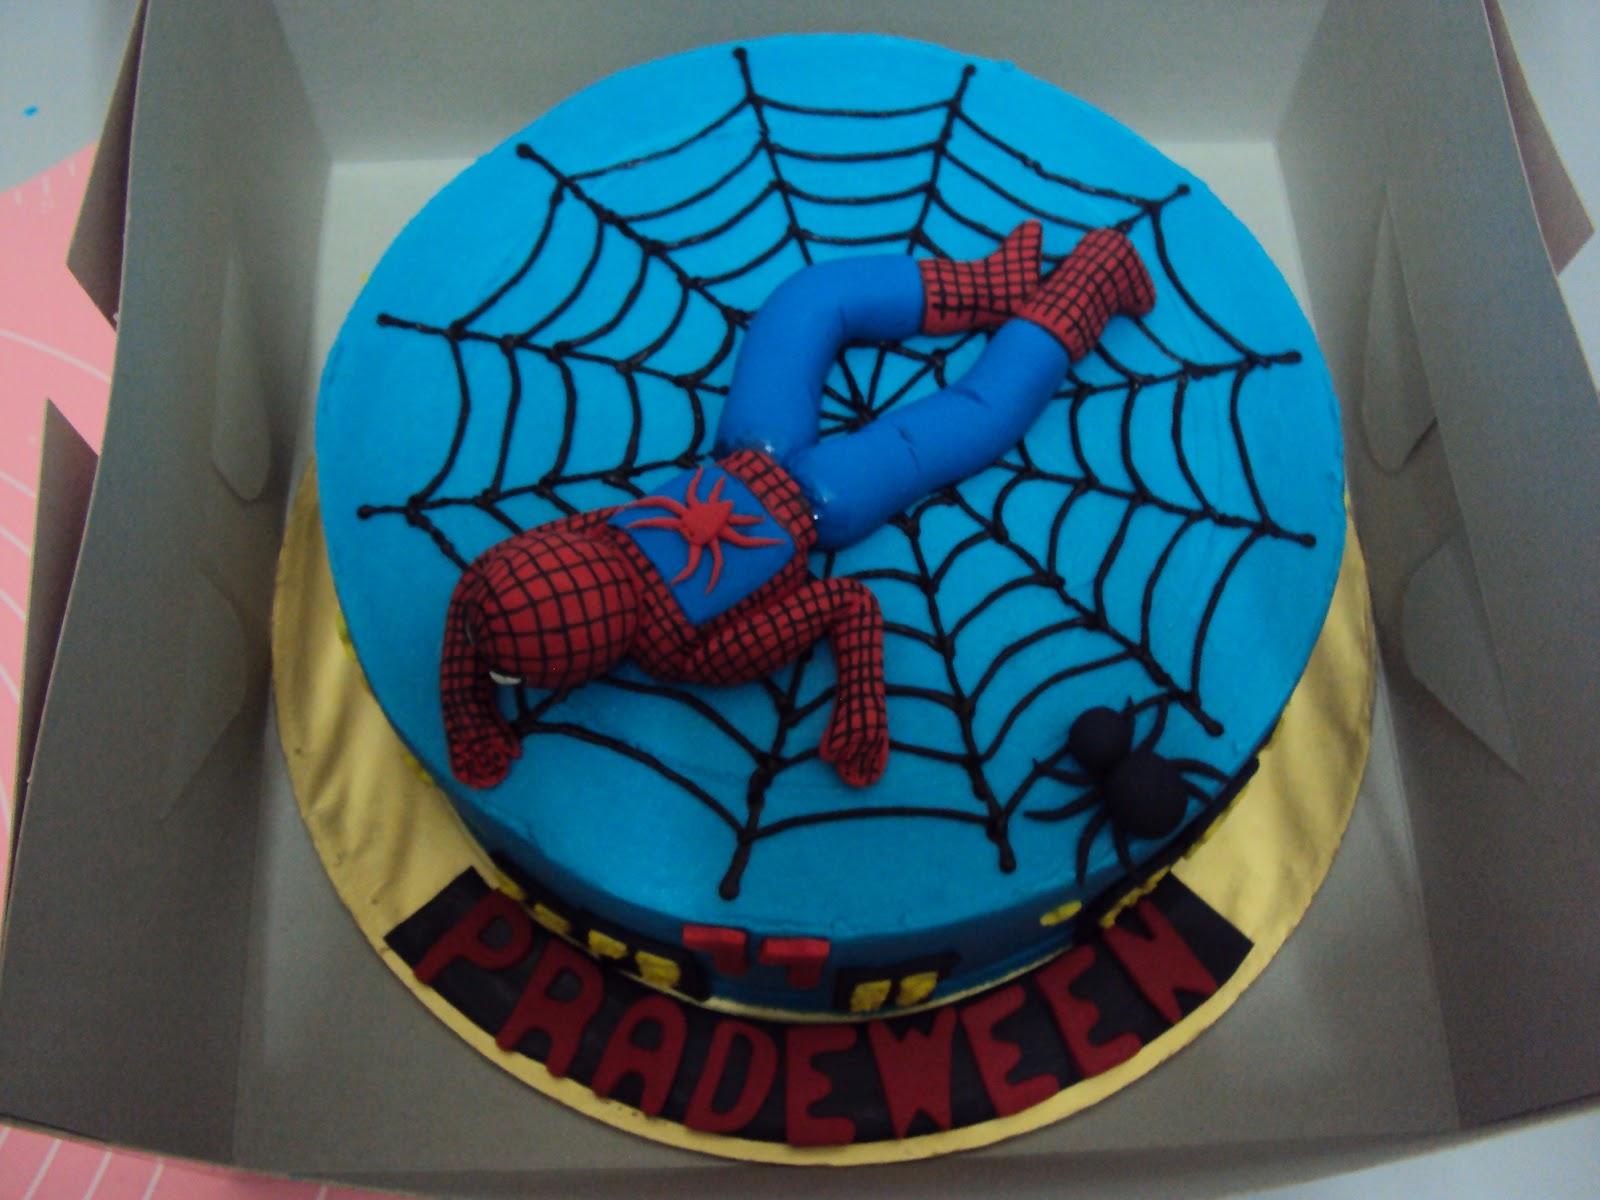 Spiderman Cake Design : L mis Cakes & Cupcakes Ipoh Contact : 012-5991233 ...